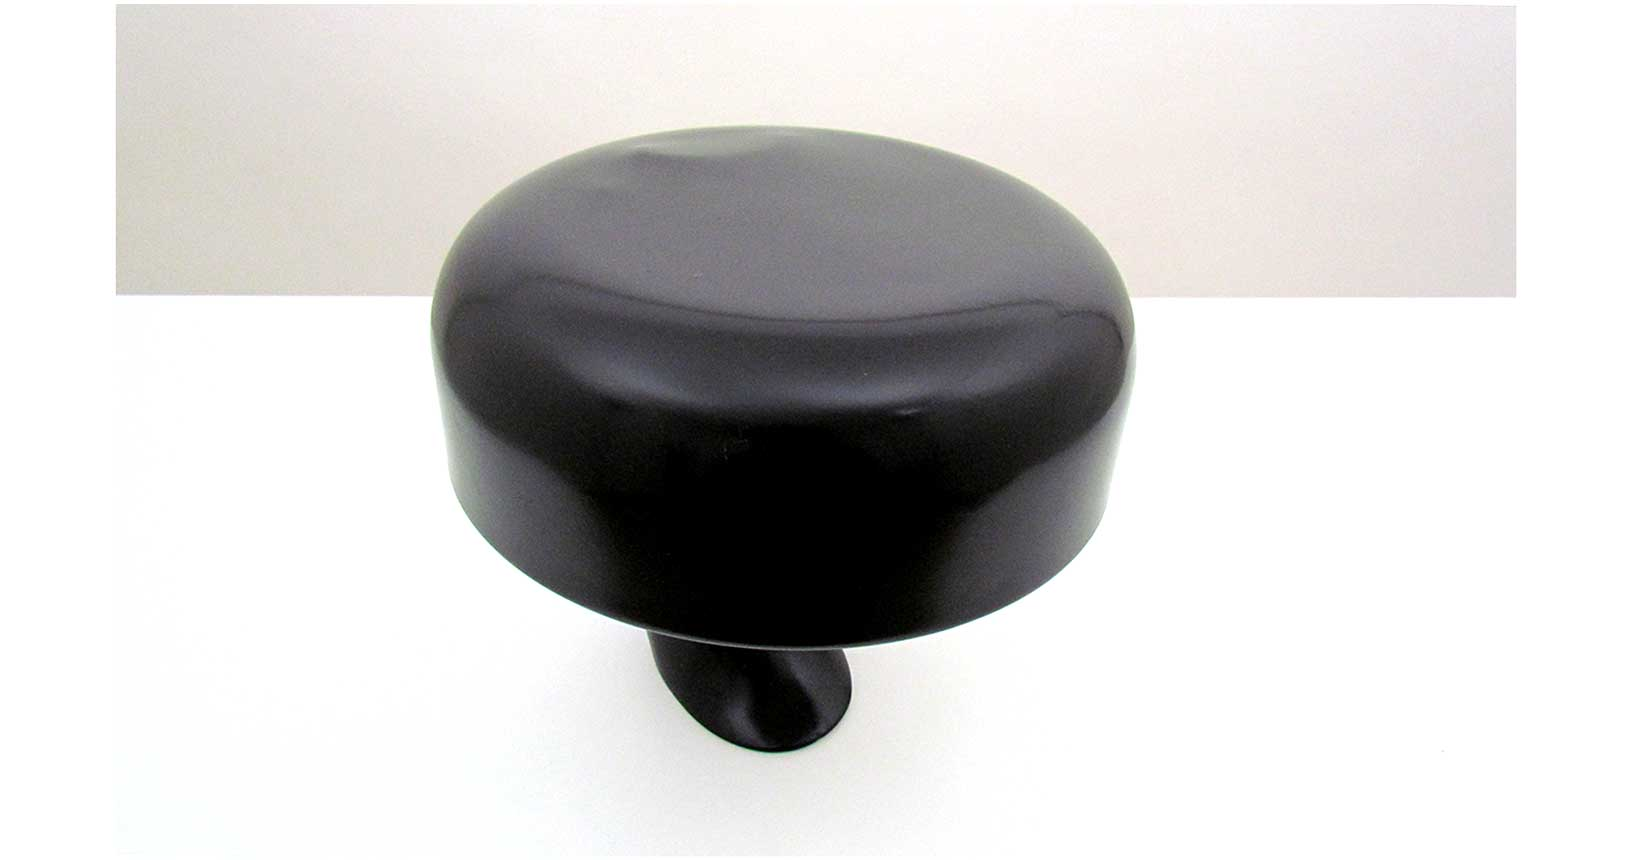 vintage iconic design furniture martinelli 615 elio luce light martinelli luce mid century lamp flos oluce artemide